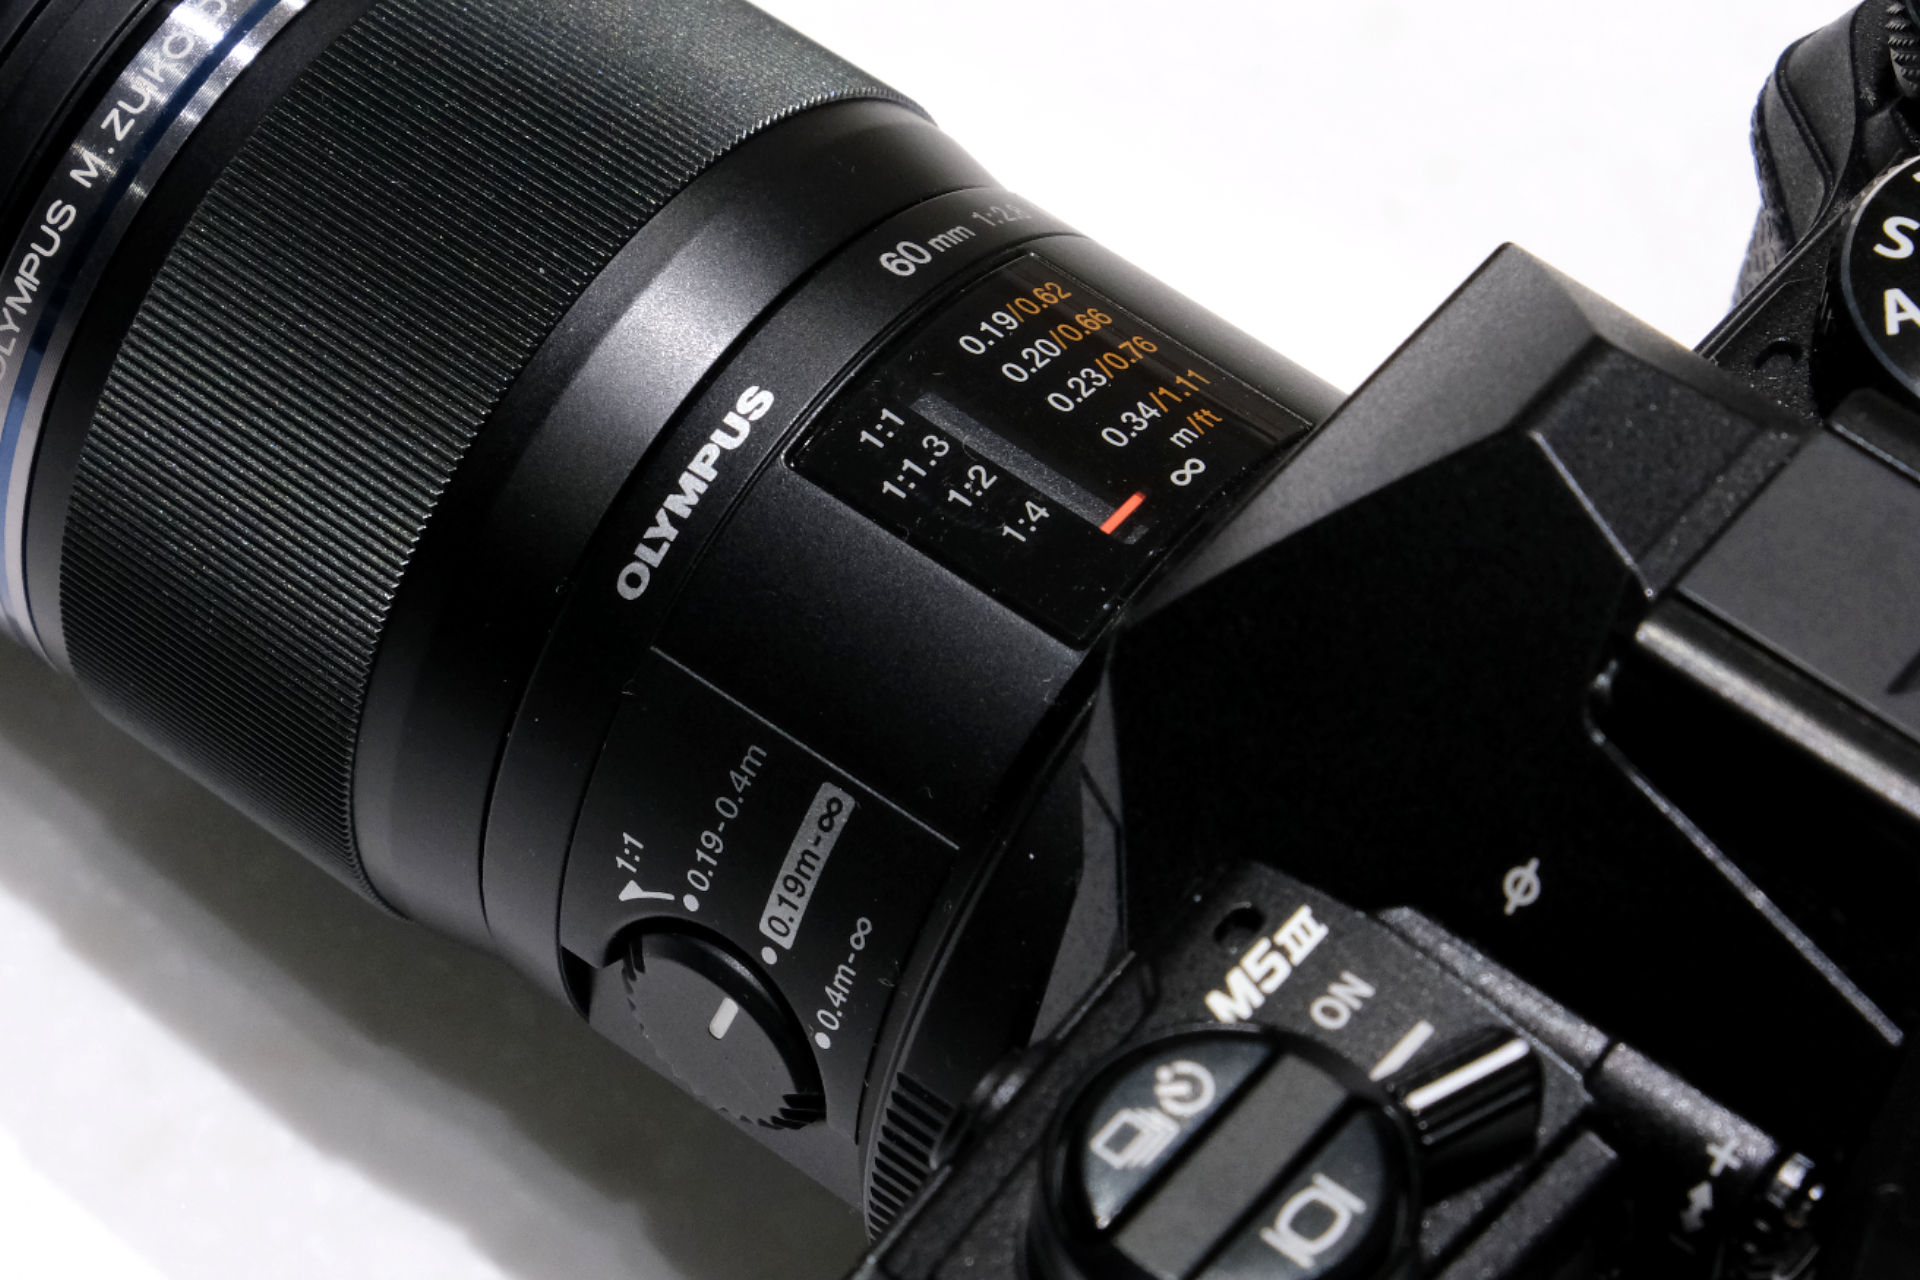 【OLYMPUS】わたしの M.ZUIKO DIGITAL ED60mm F2.8 Macro との付き合い方